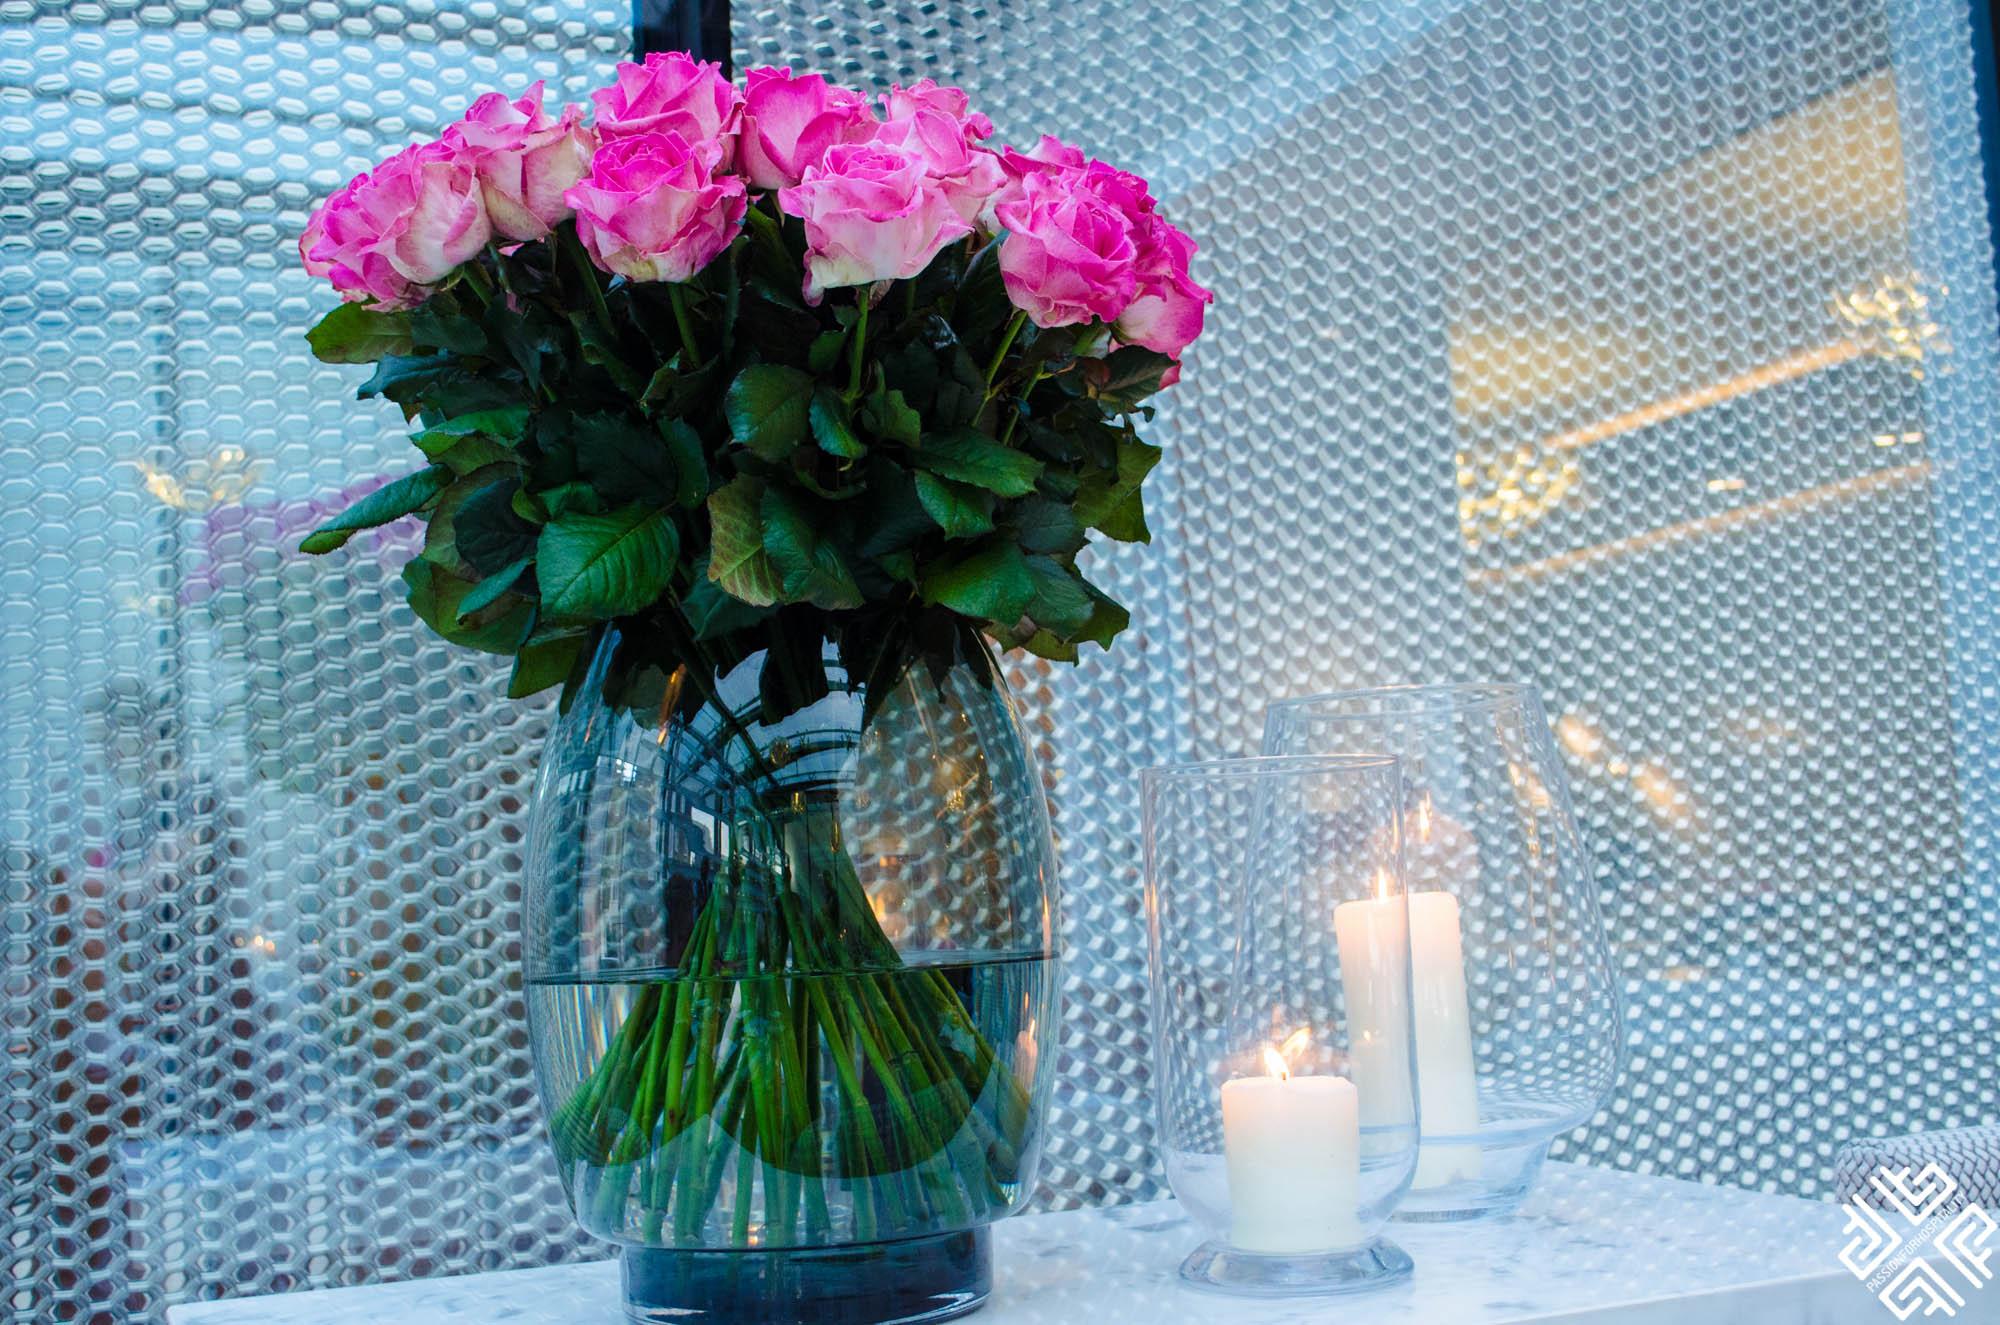 pret-a-portea-roses-the-berkeley-1